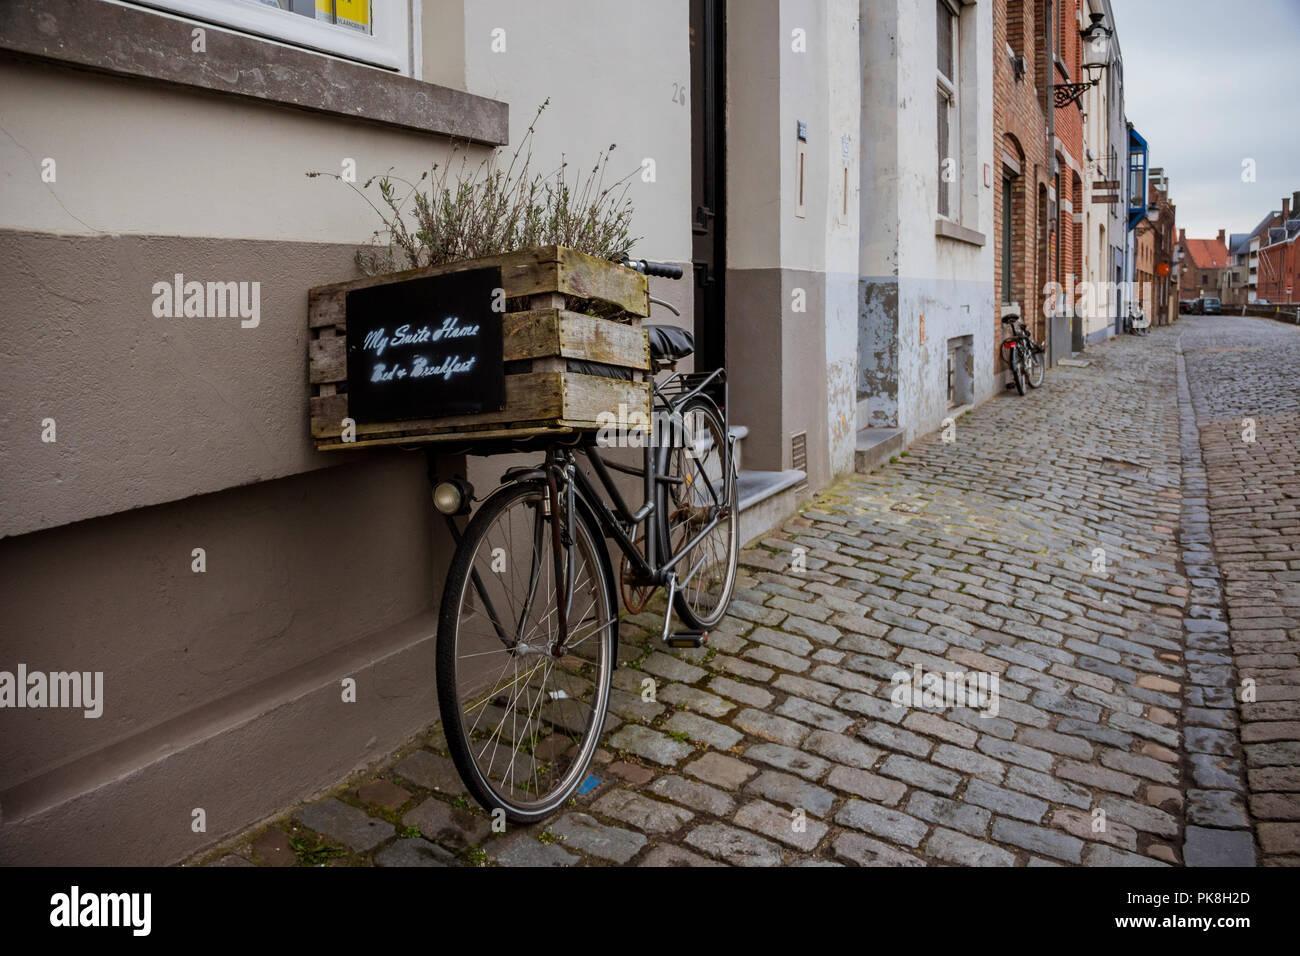 Bicycle at Bruges, Belgium - Stock Image